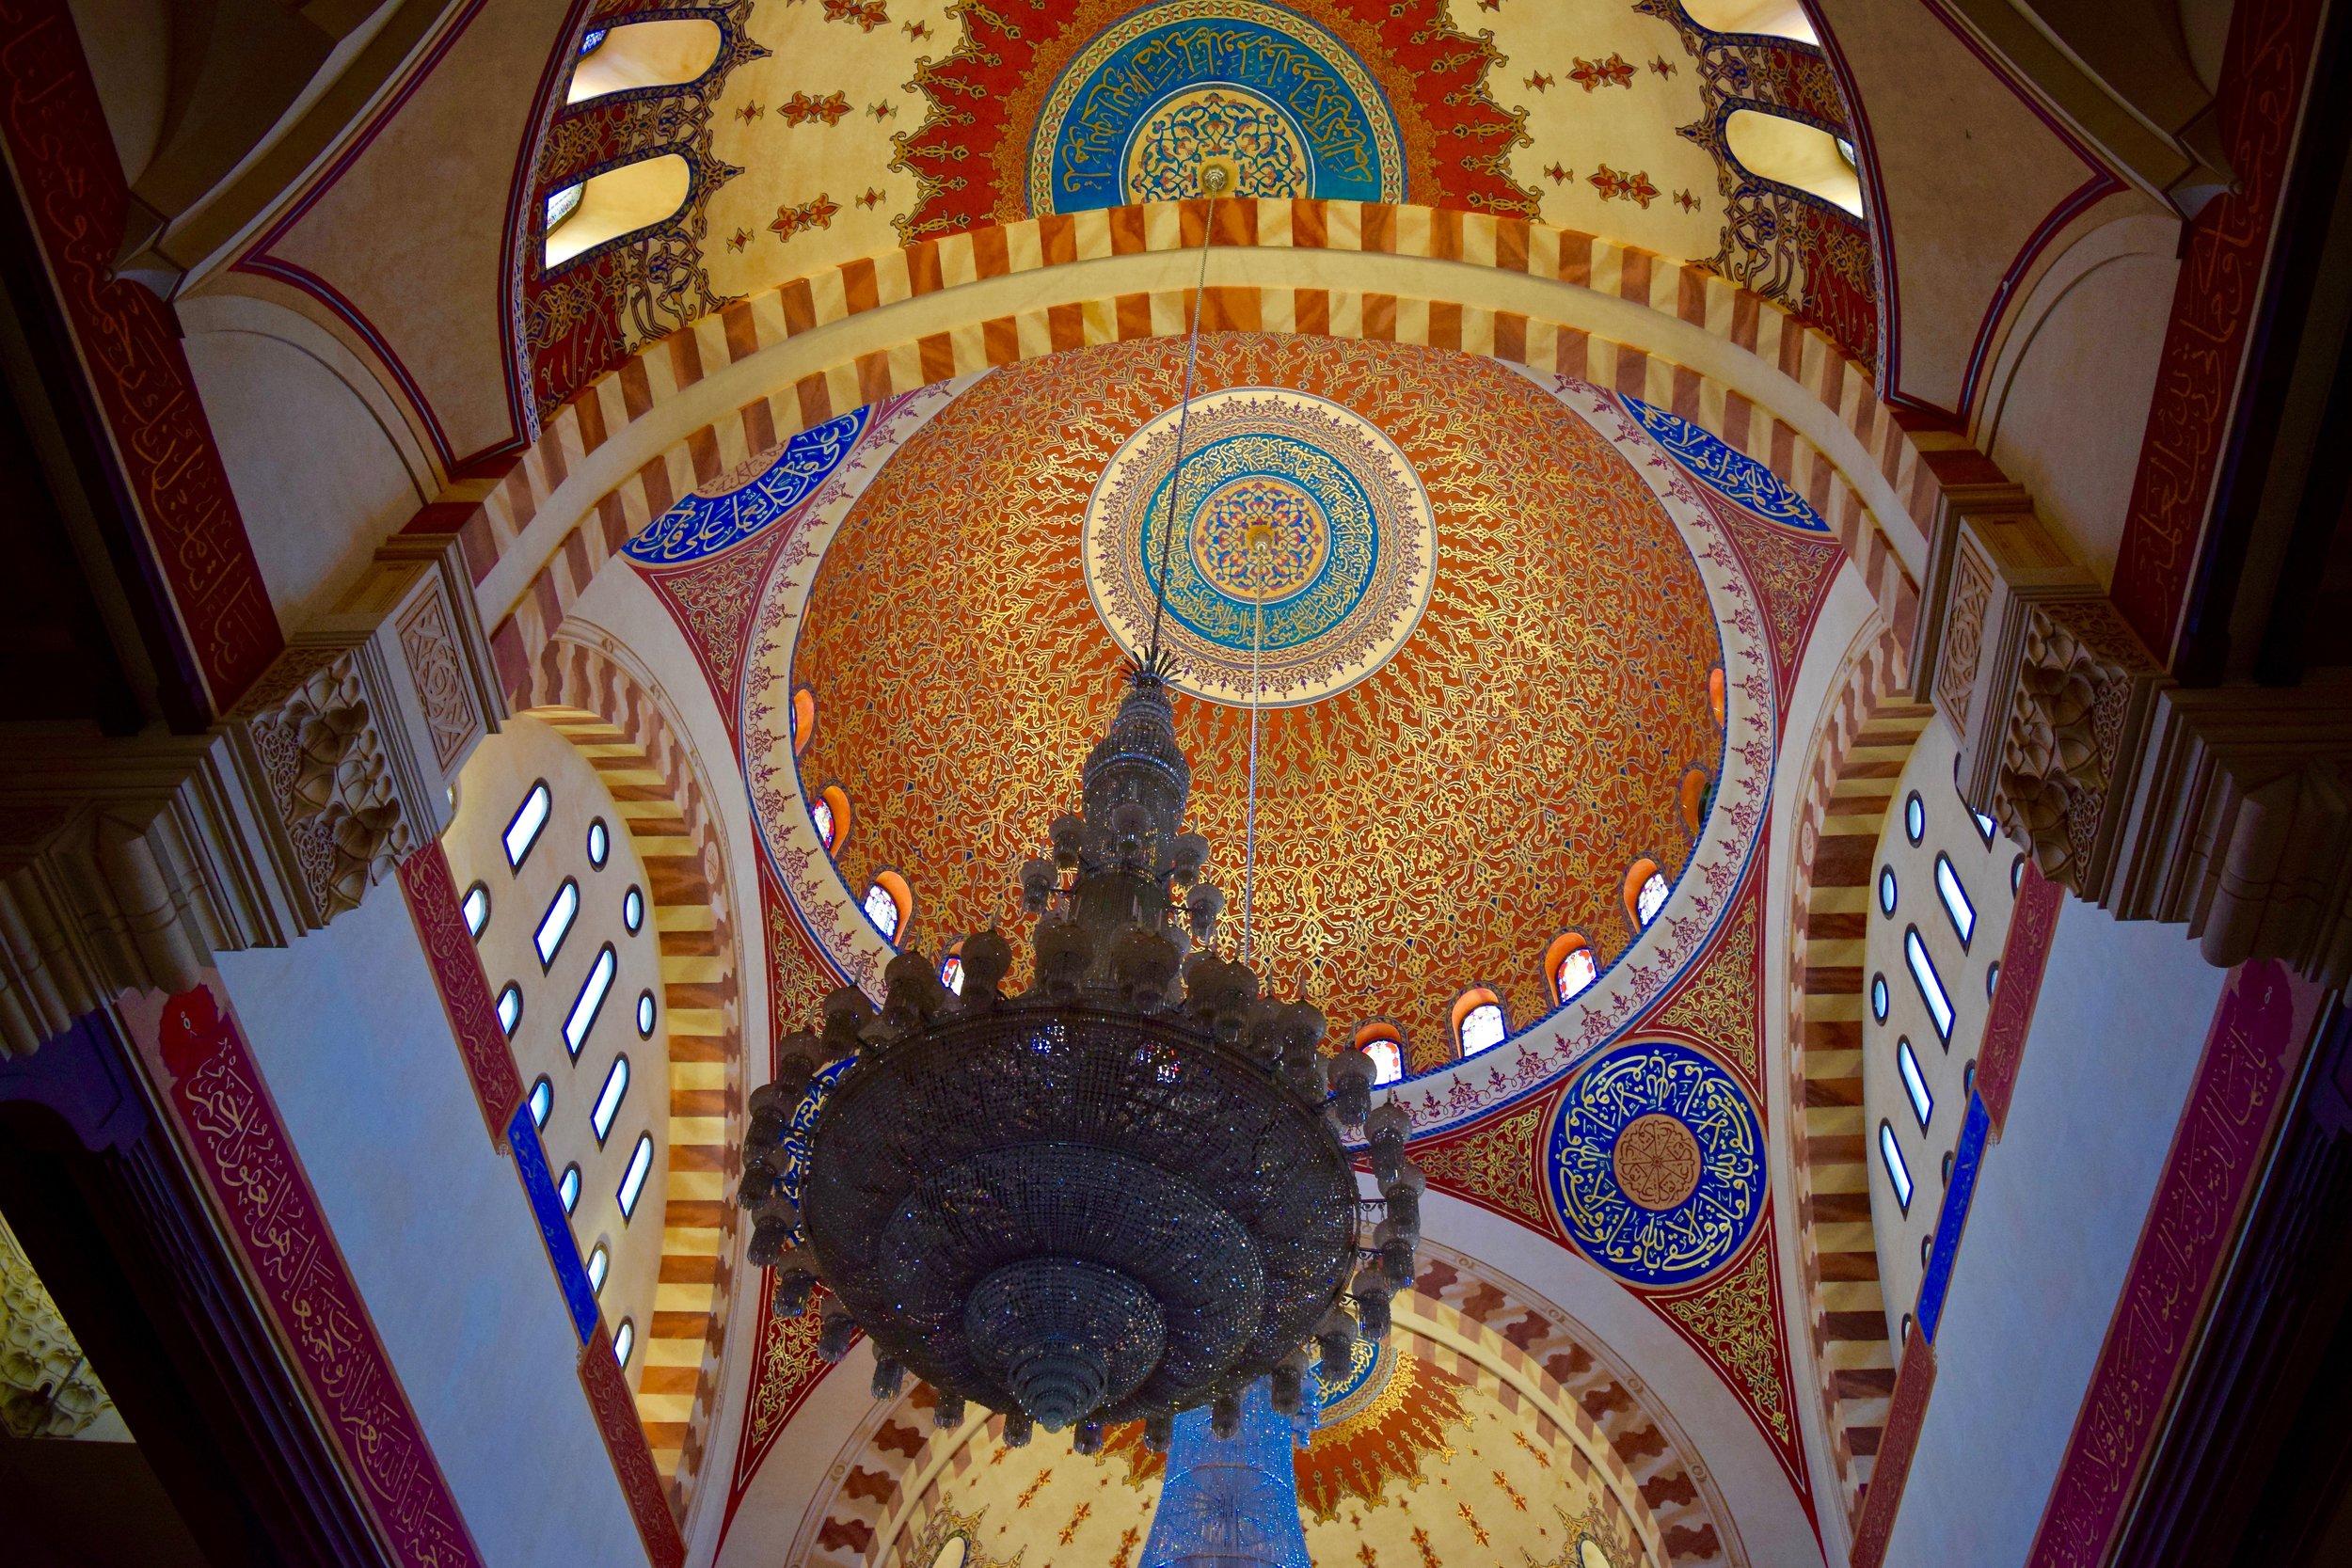 Interior of the Mohammad Al-Amin Mosque